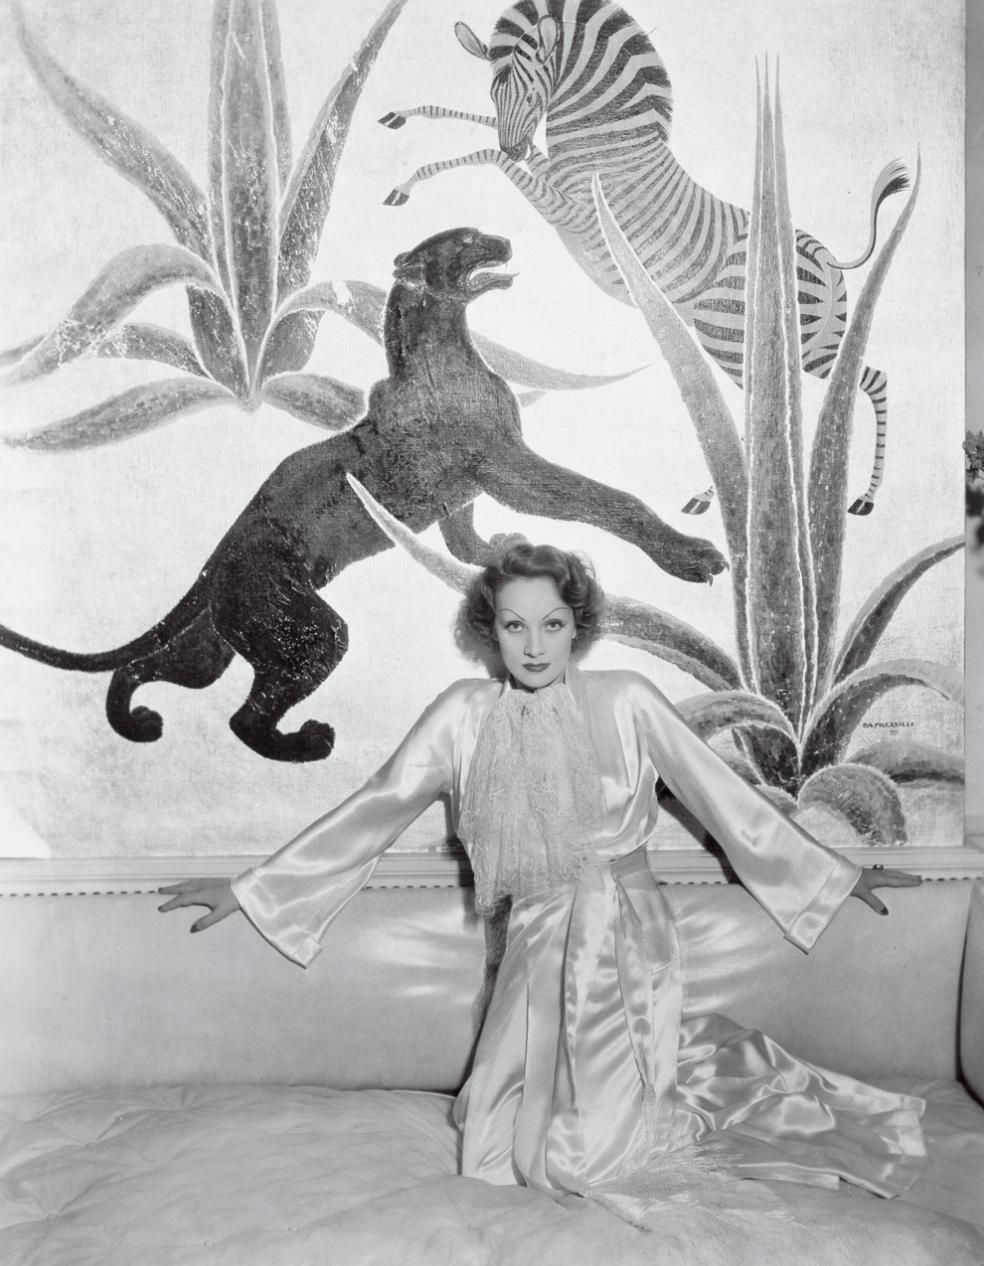 Marlene Dietrich on NORASIBLEY.COM